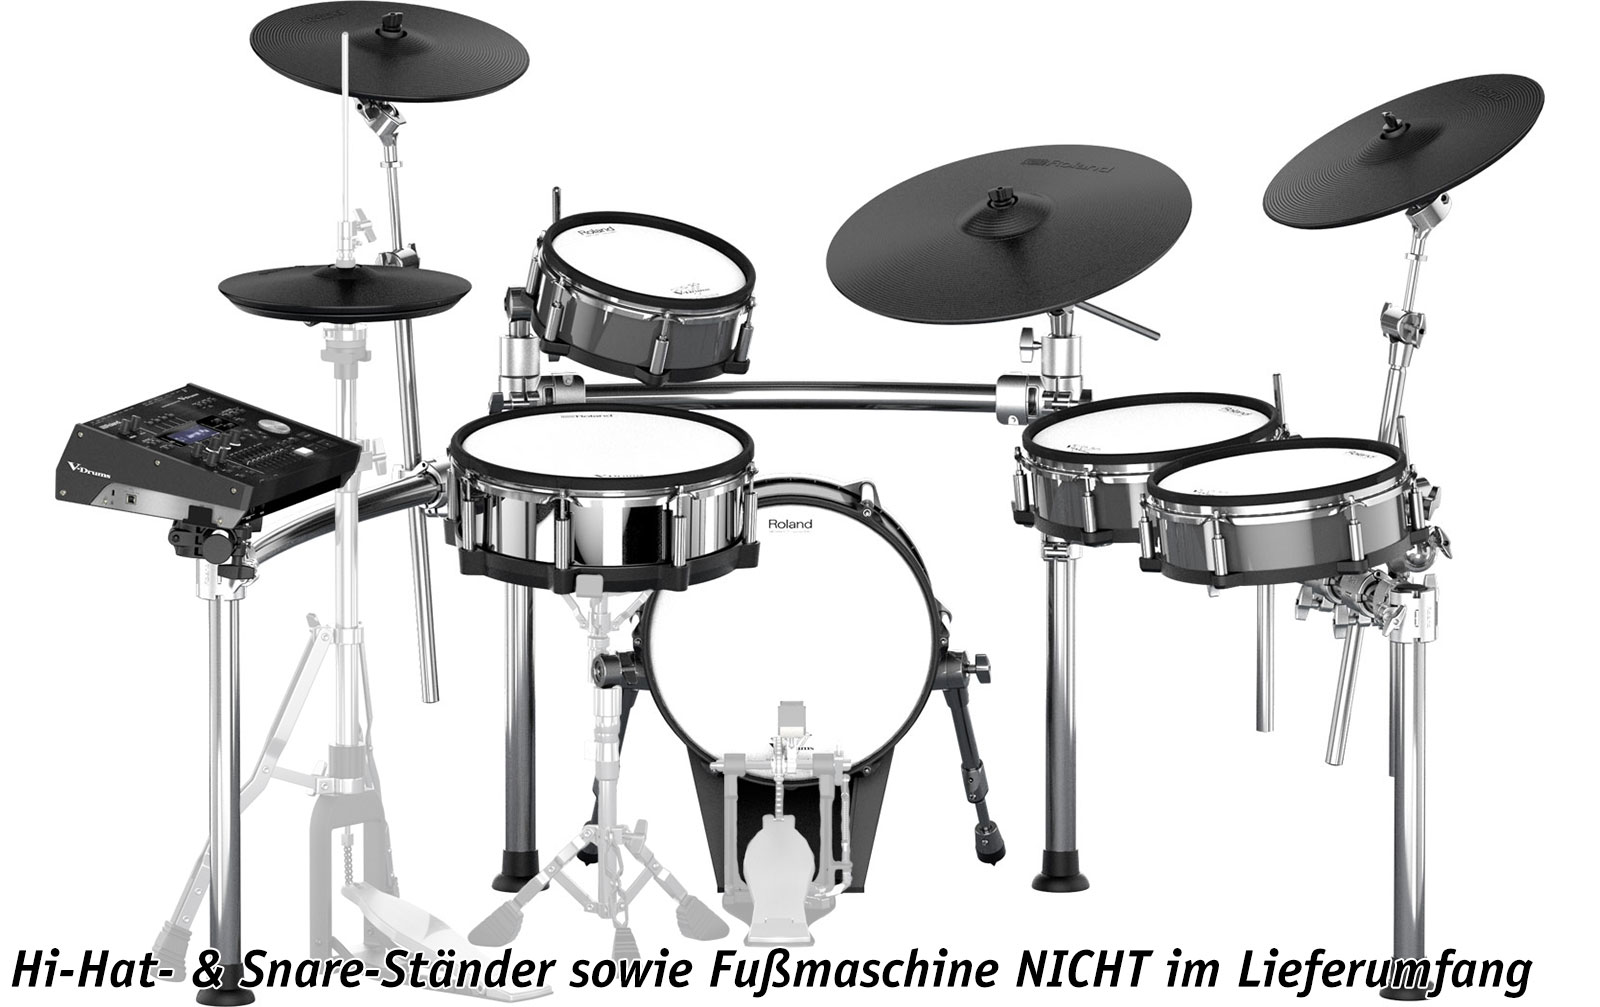 roland-td-50kv-v-drum-set